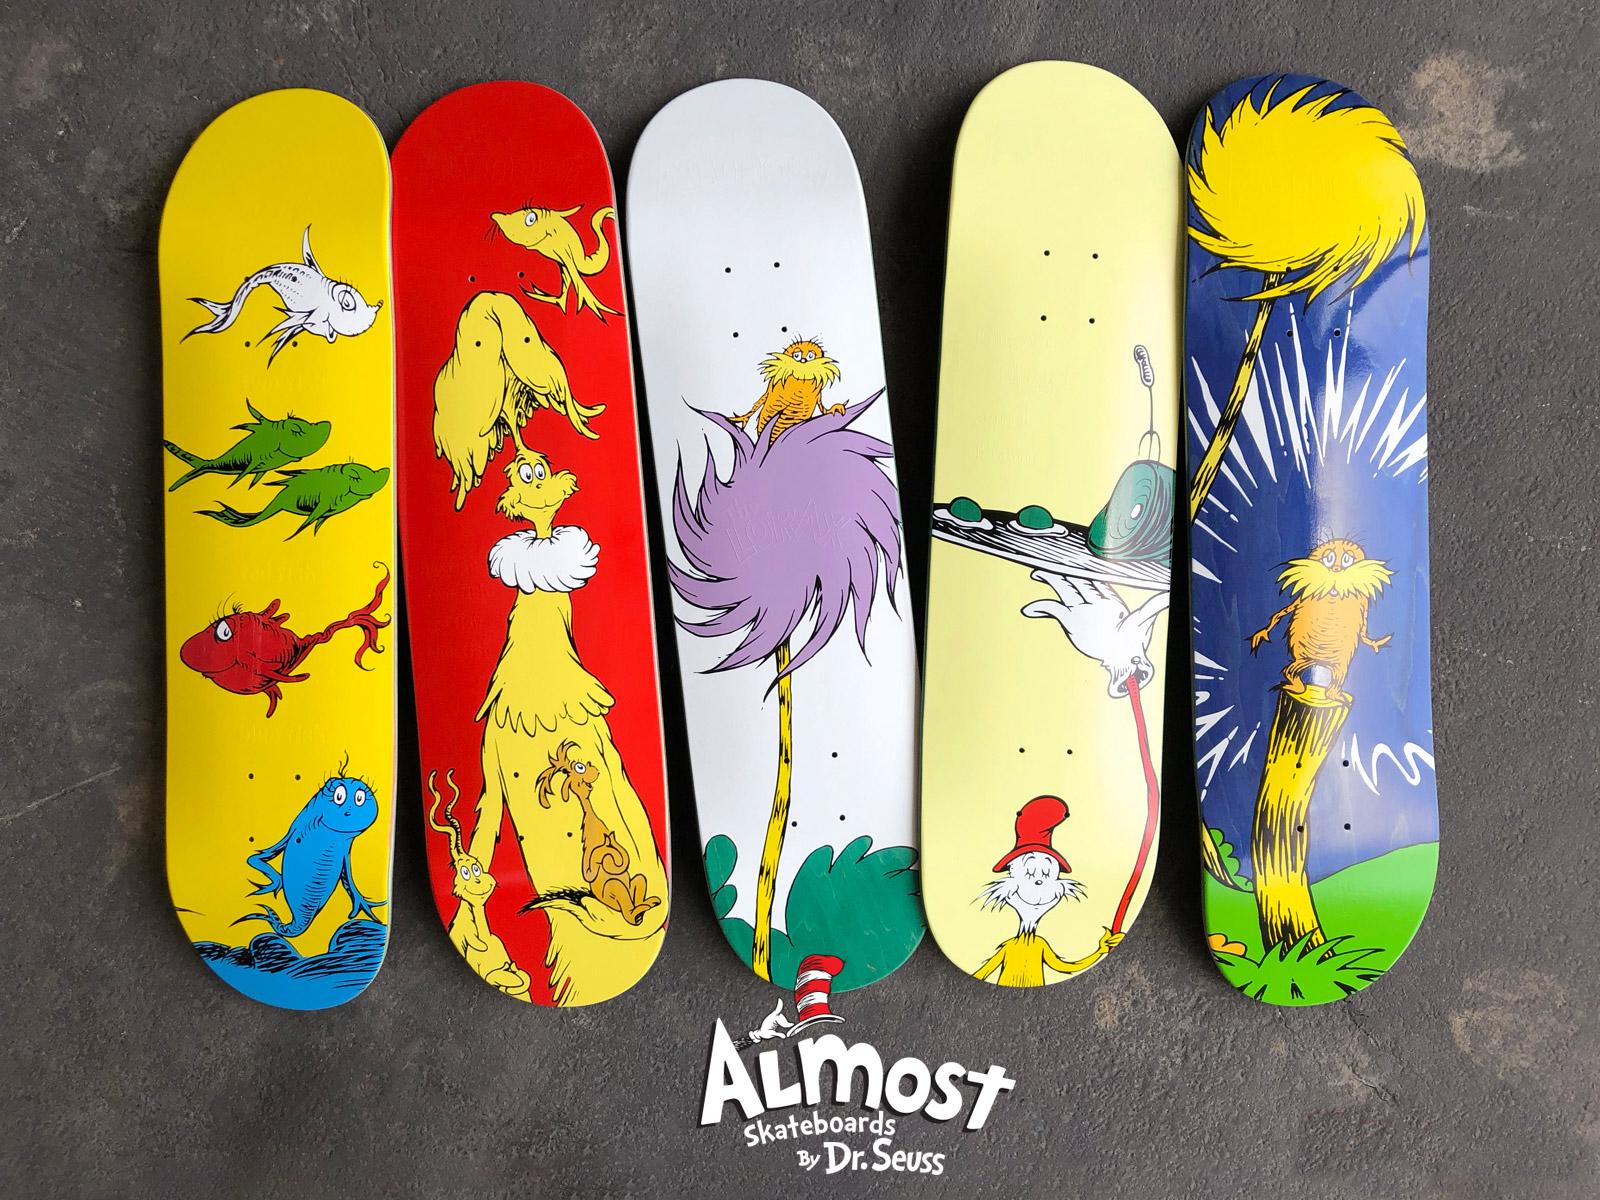 Almost_Skateboards_by_Dr_Seuss.jpg